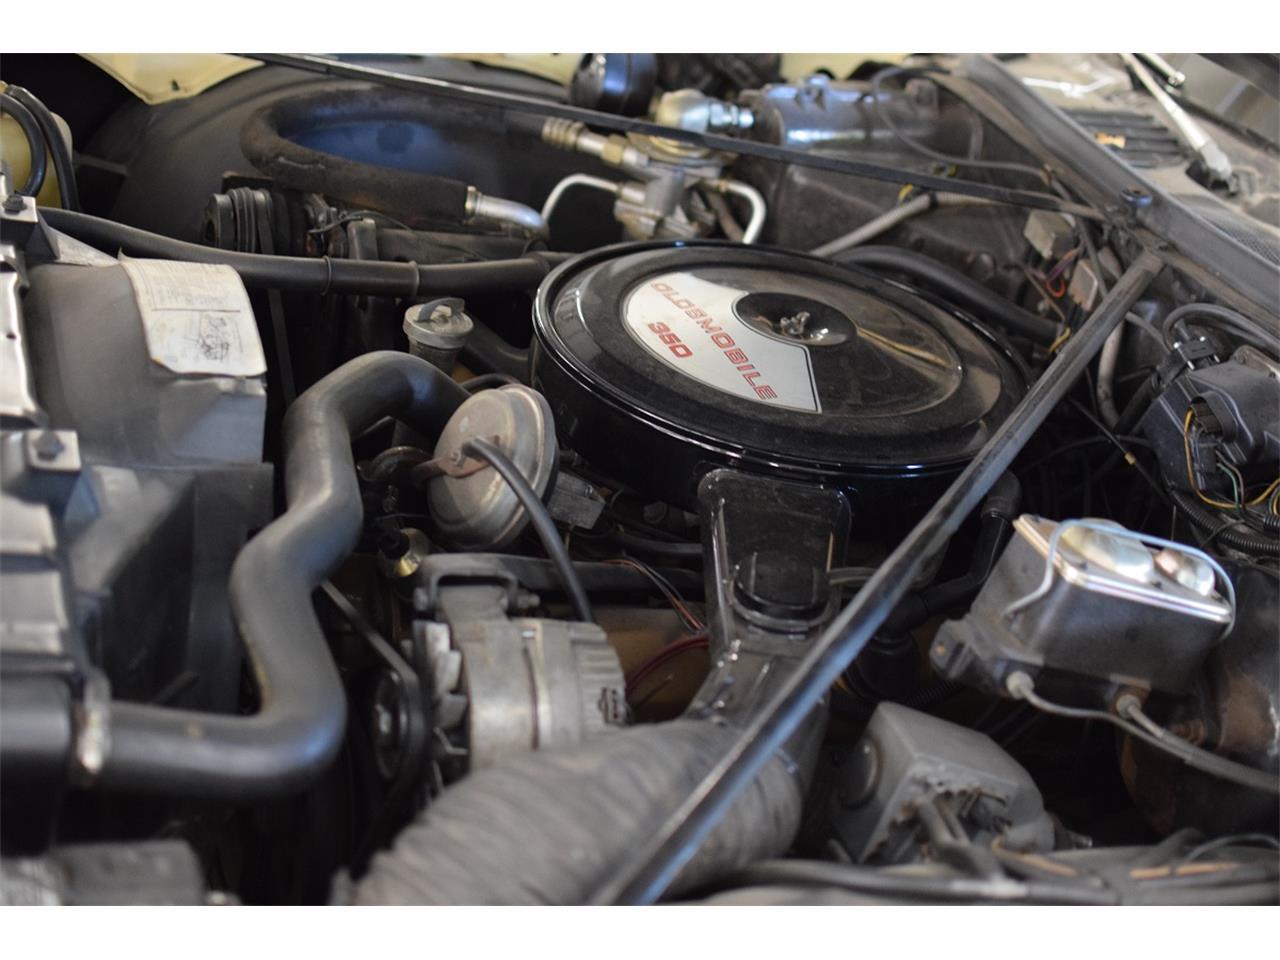 Large Picture of Classic '71 Chevrolet Corvette - $14,500.00 - Q4GJ